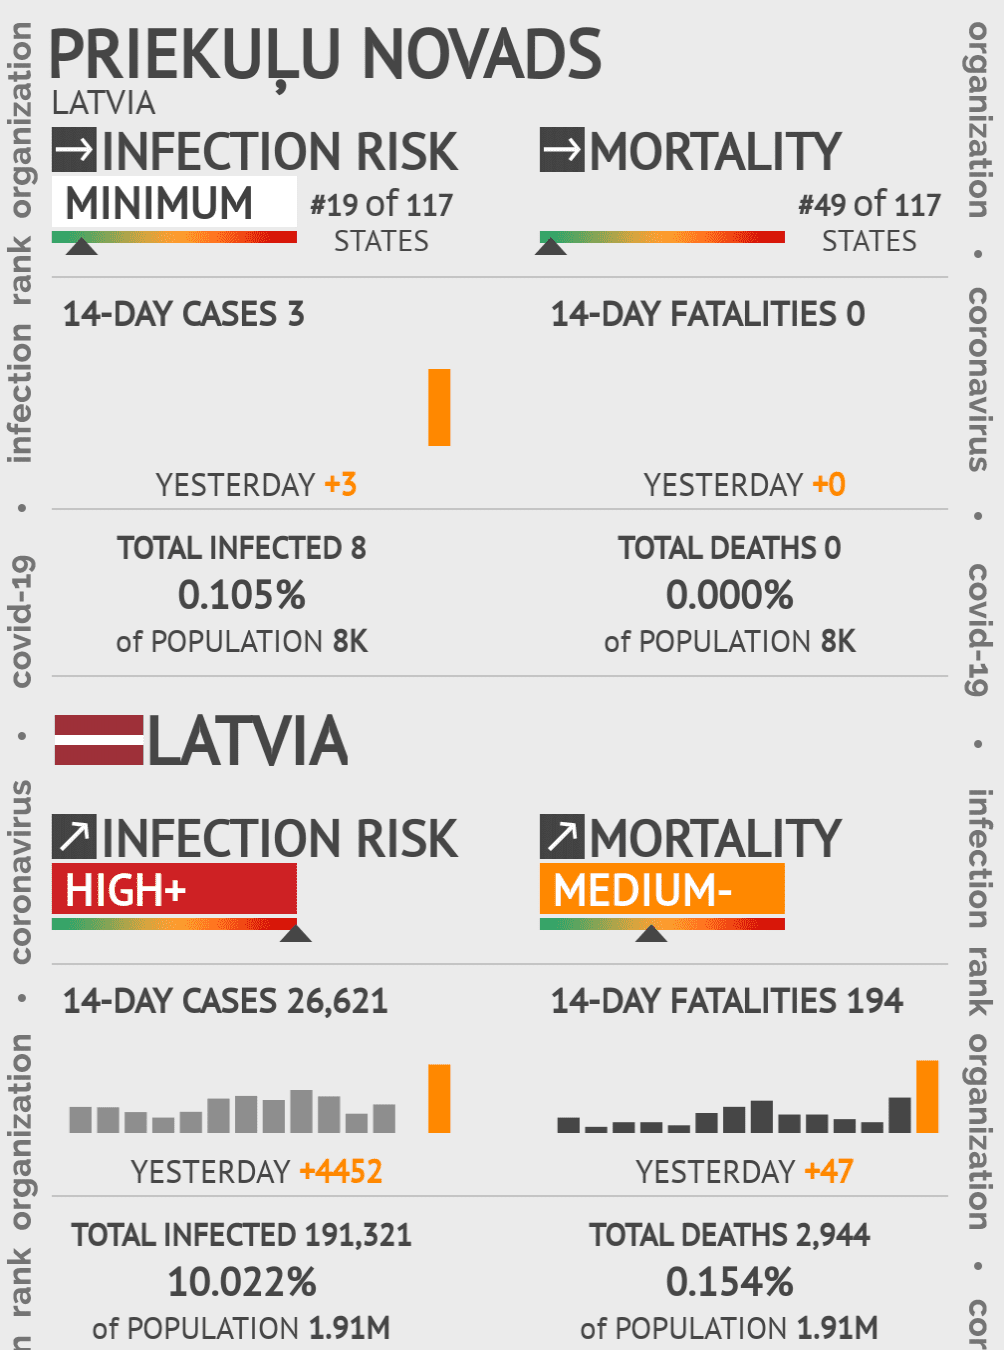 Priekuļu novads Coronavirus Covid-19 Risk of Infection on May 14, 2020